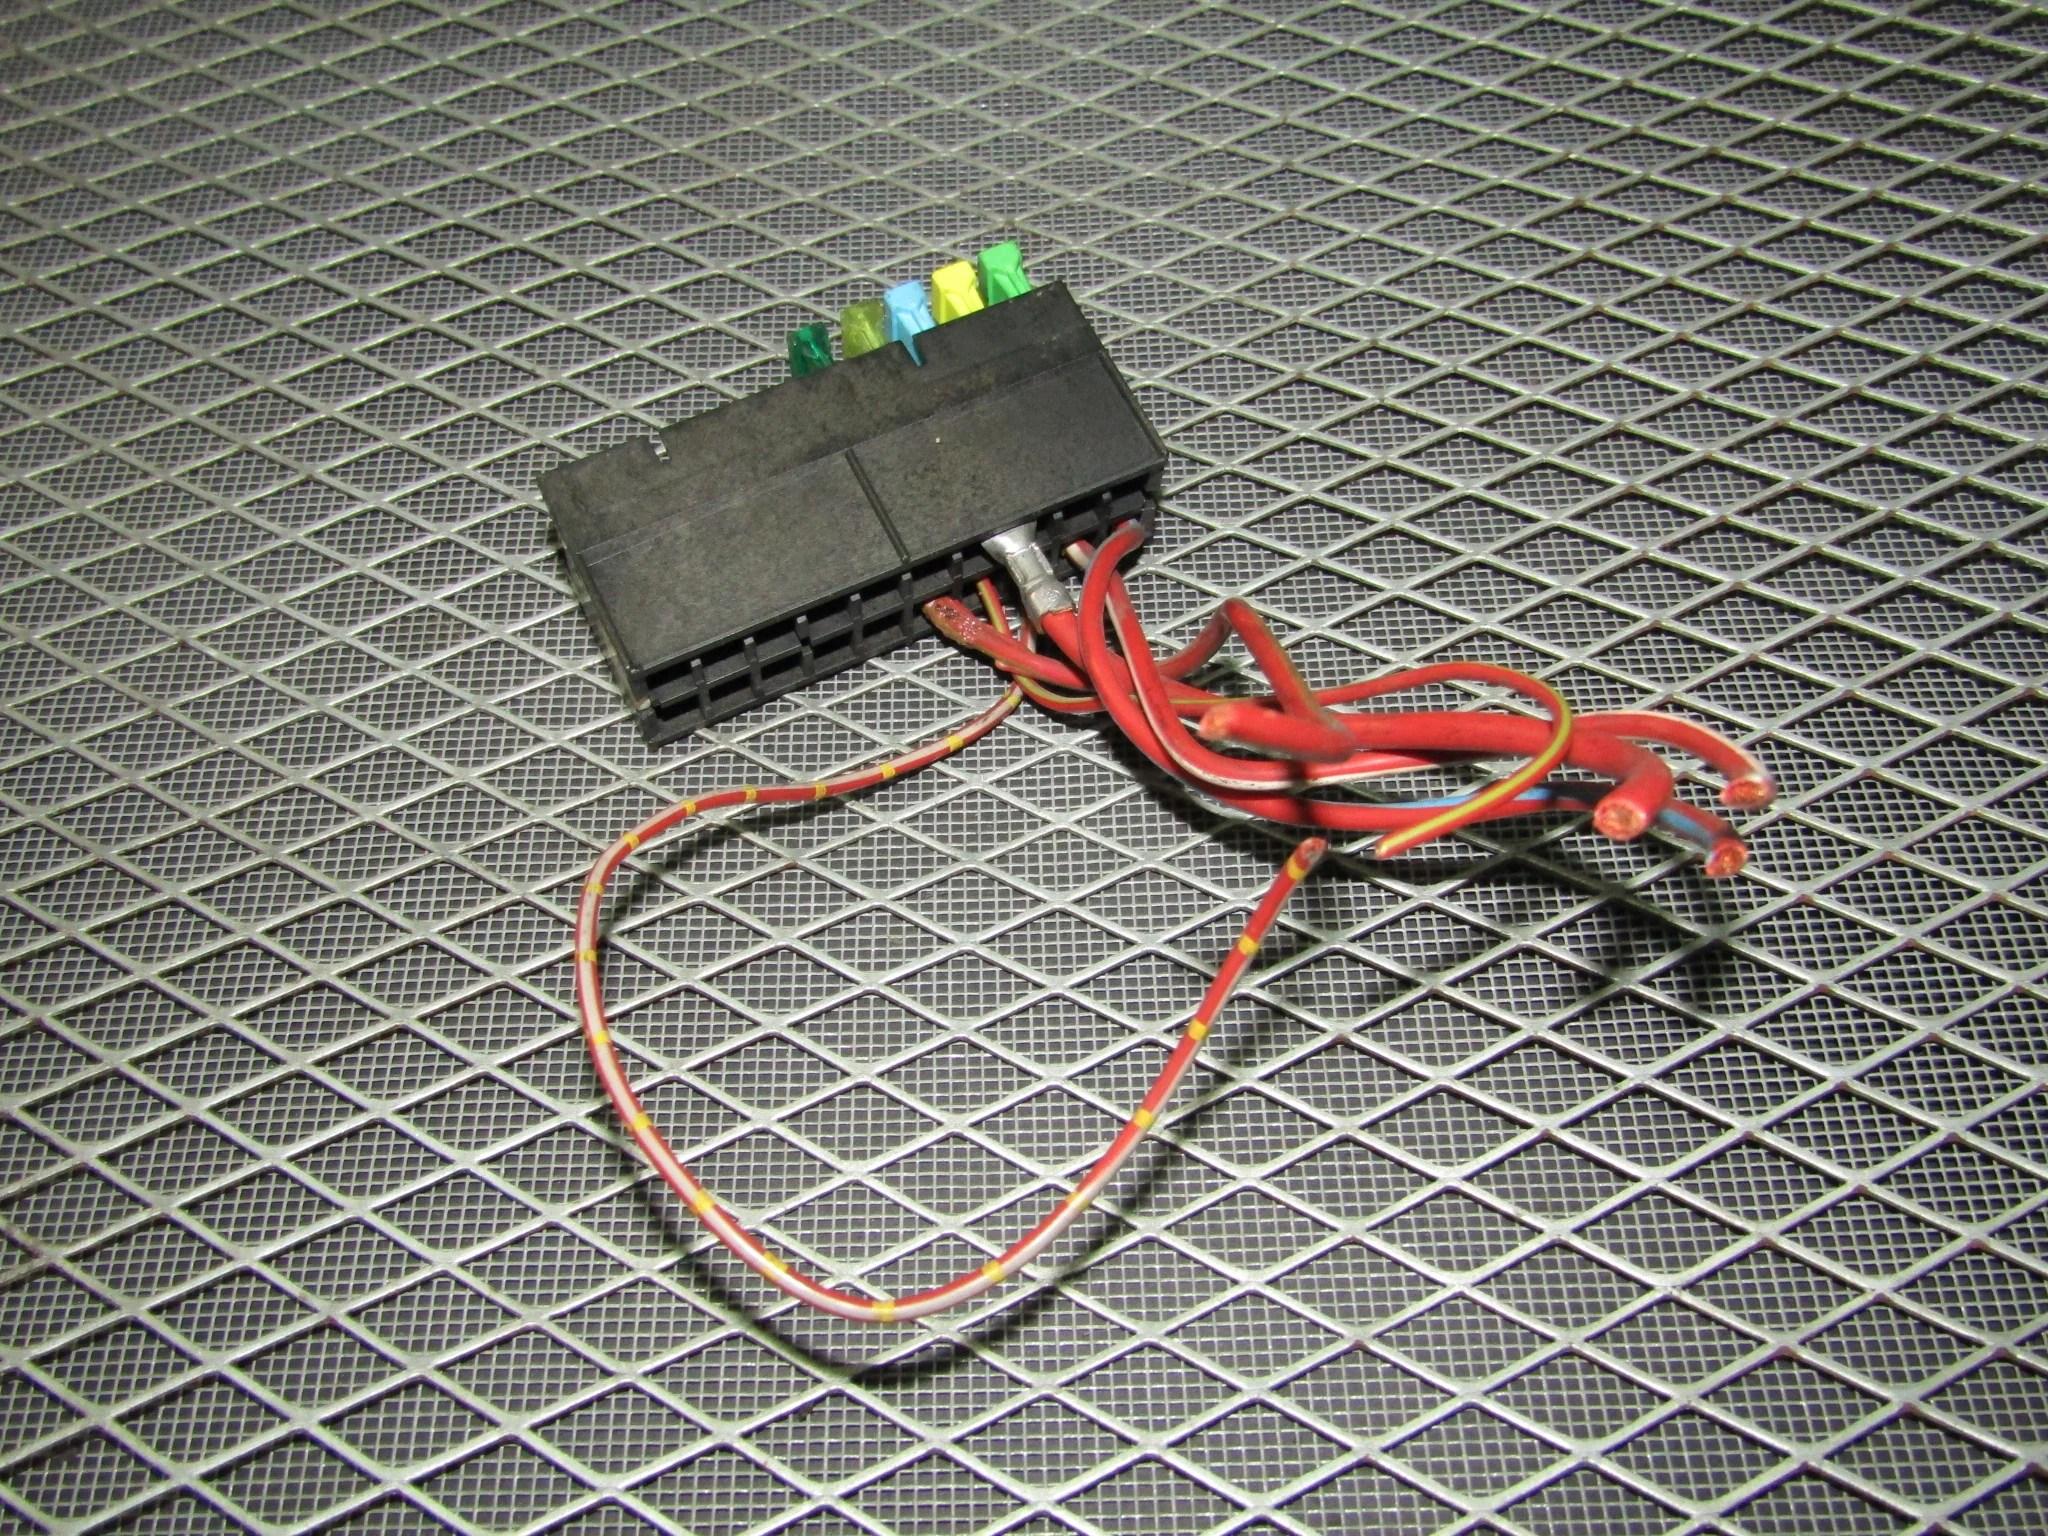 92 93 94 95 bmw 325 oem engine fuse box [ 2048 x 1536 Pixel ]